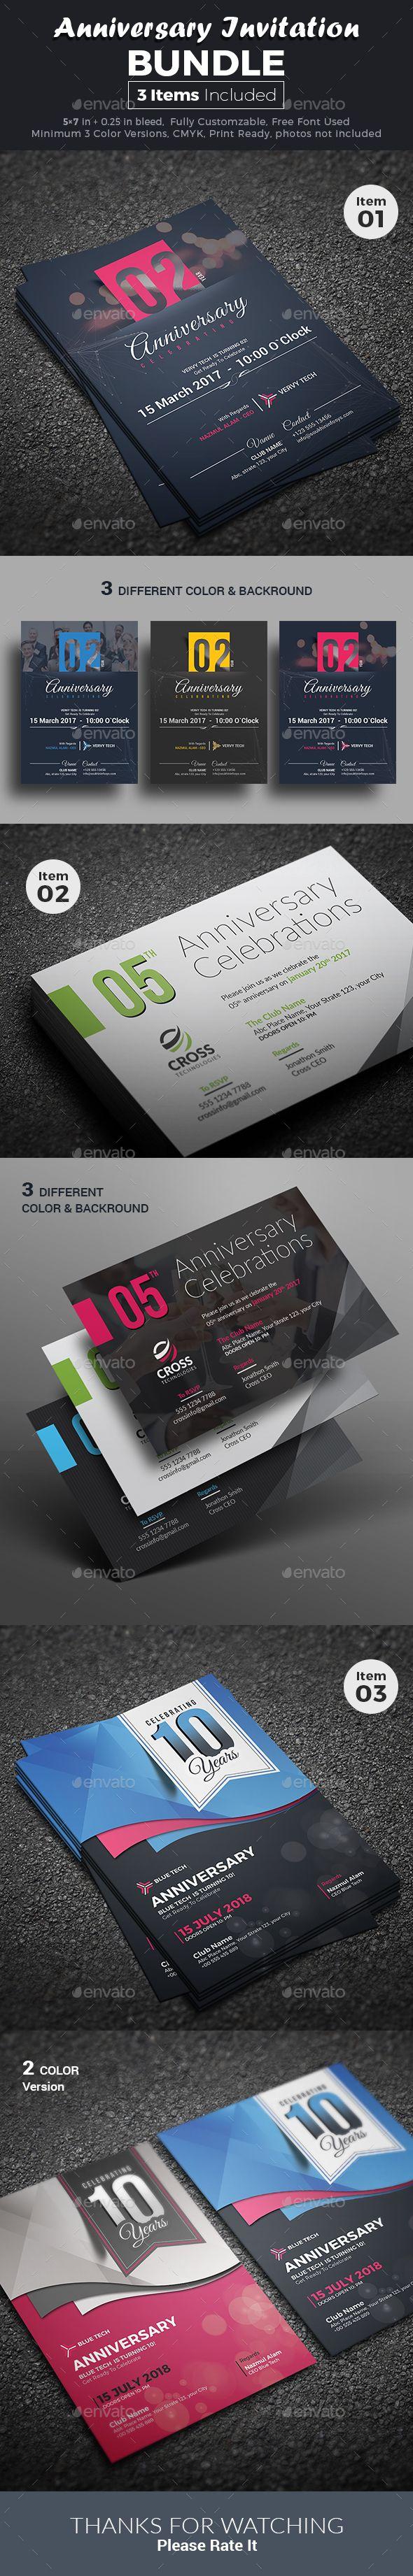 best ideas about corporate invitation corporate anniversary invitation